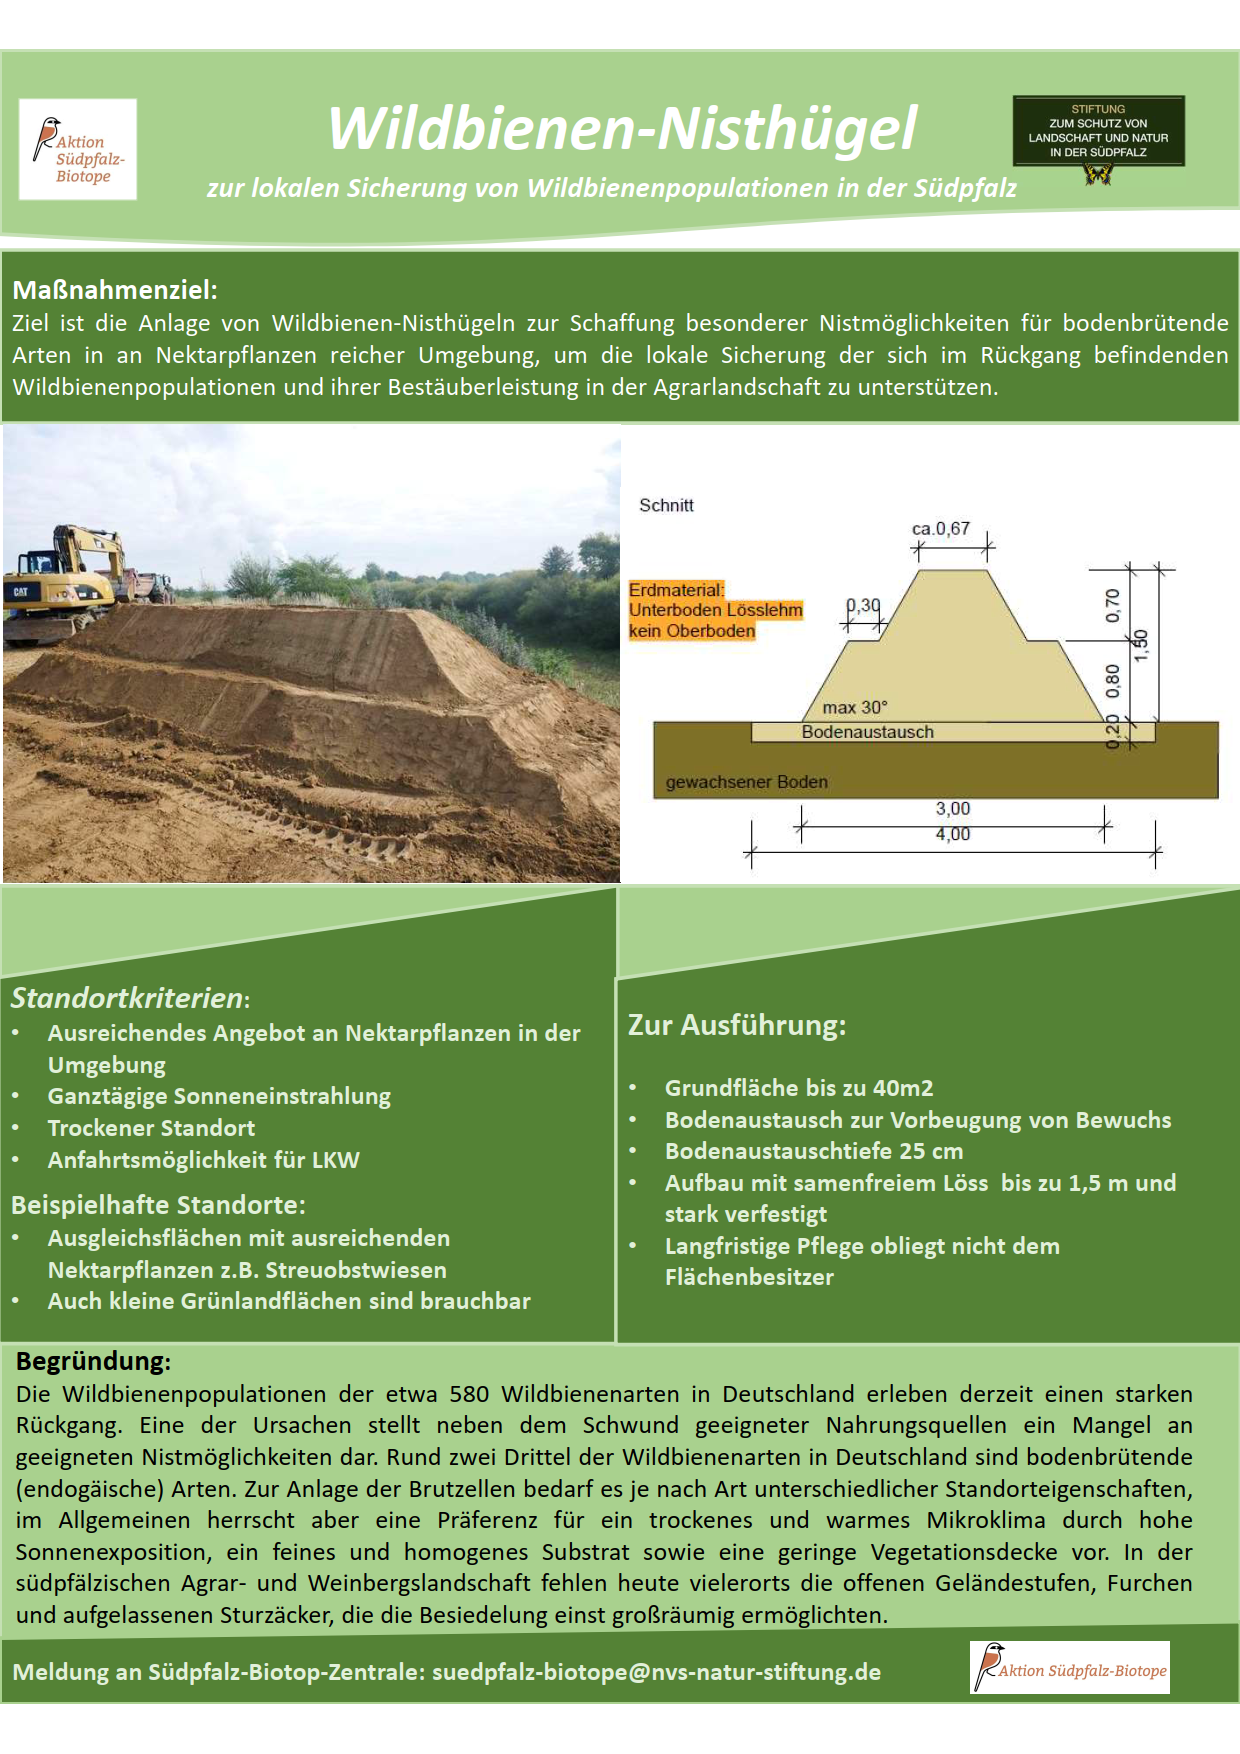 Südpfalz-Biotop-Zentrale